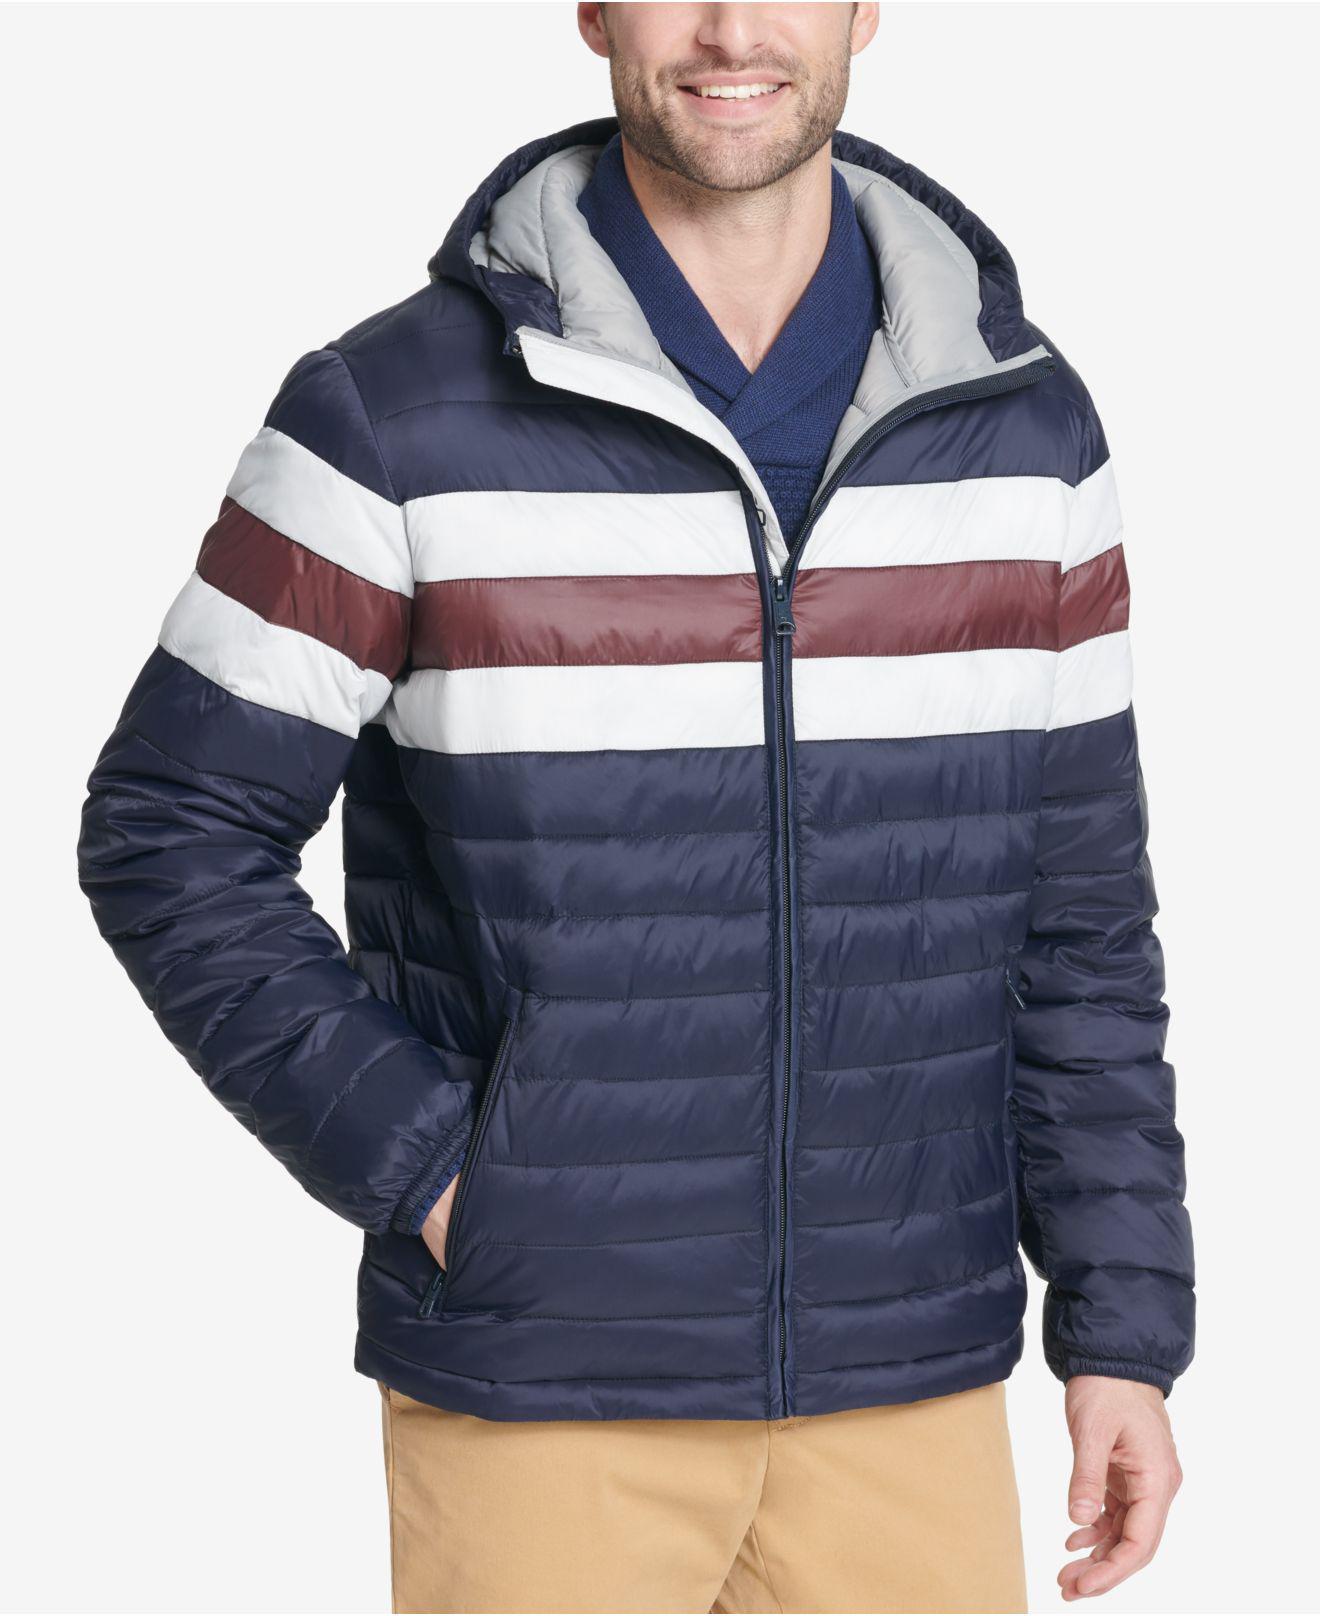 799f7540e897 Lyst - Tommy Hilfiger Color Block Hooded Ski Coat